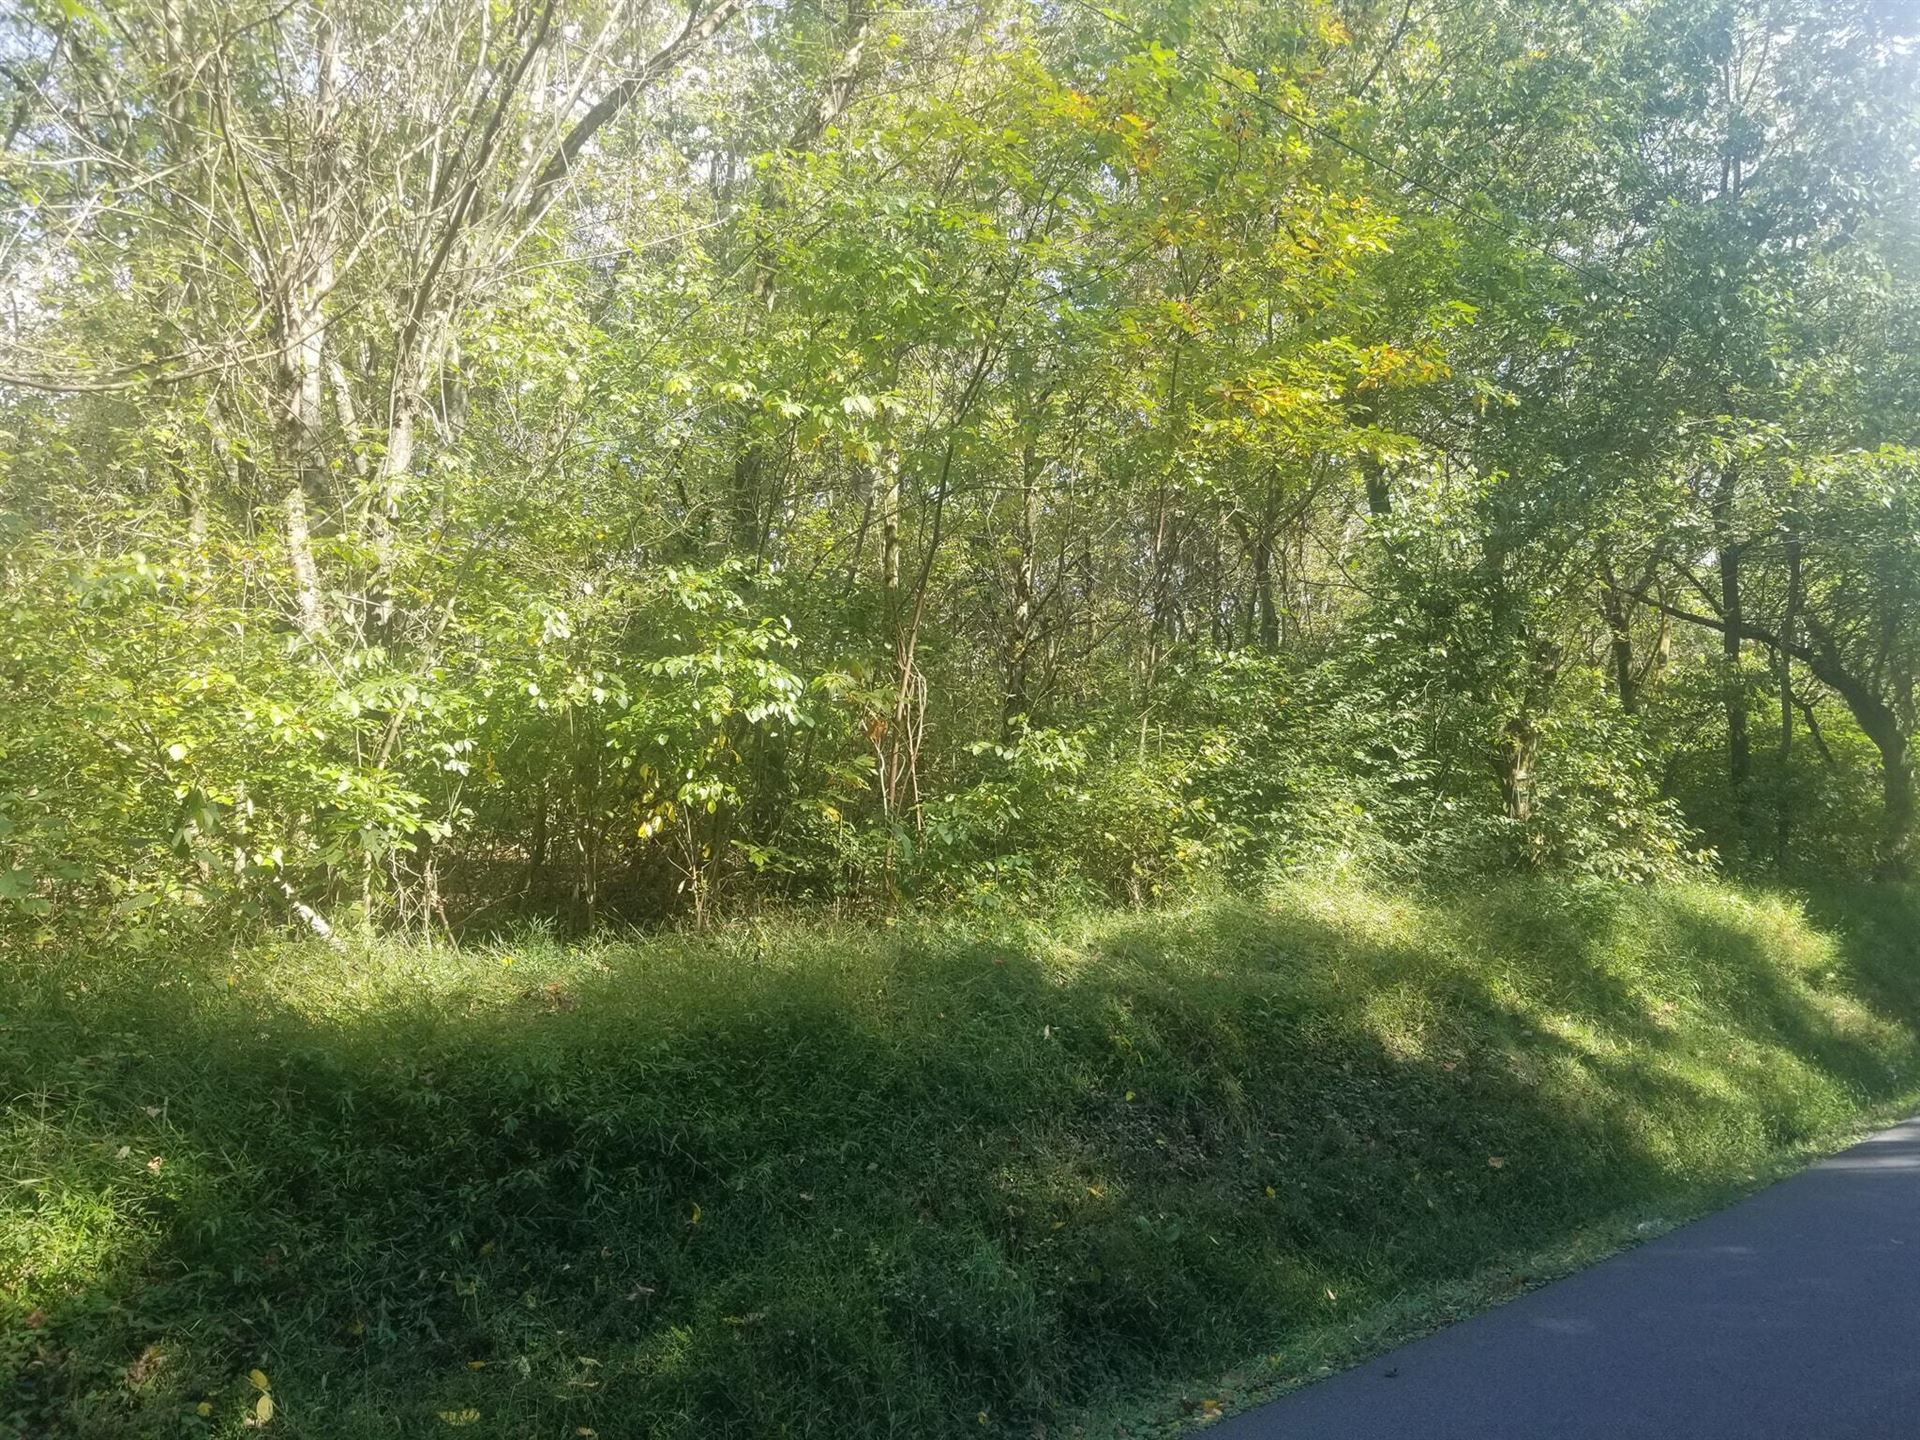 Photo of Tbd Seneker Lane, Blountville, TN 37617 (MLS # 9930025)